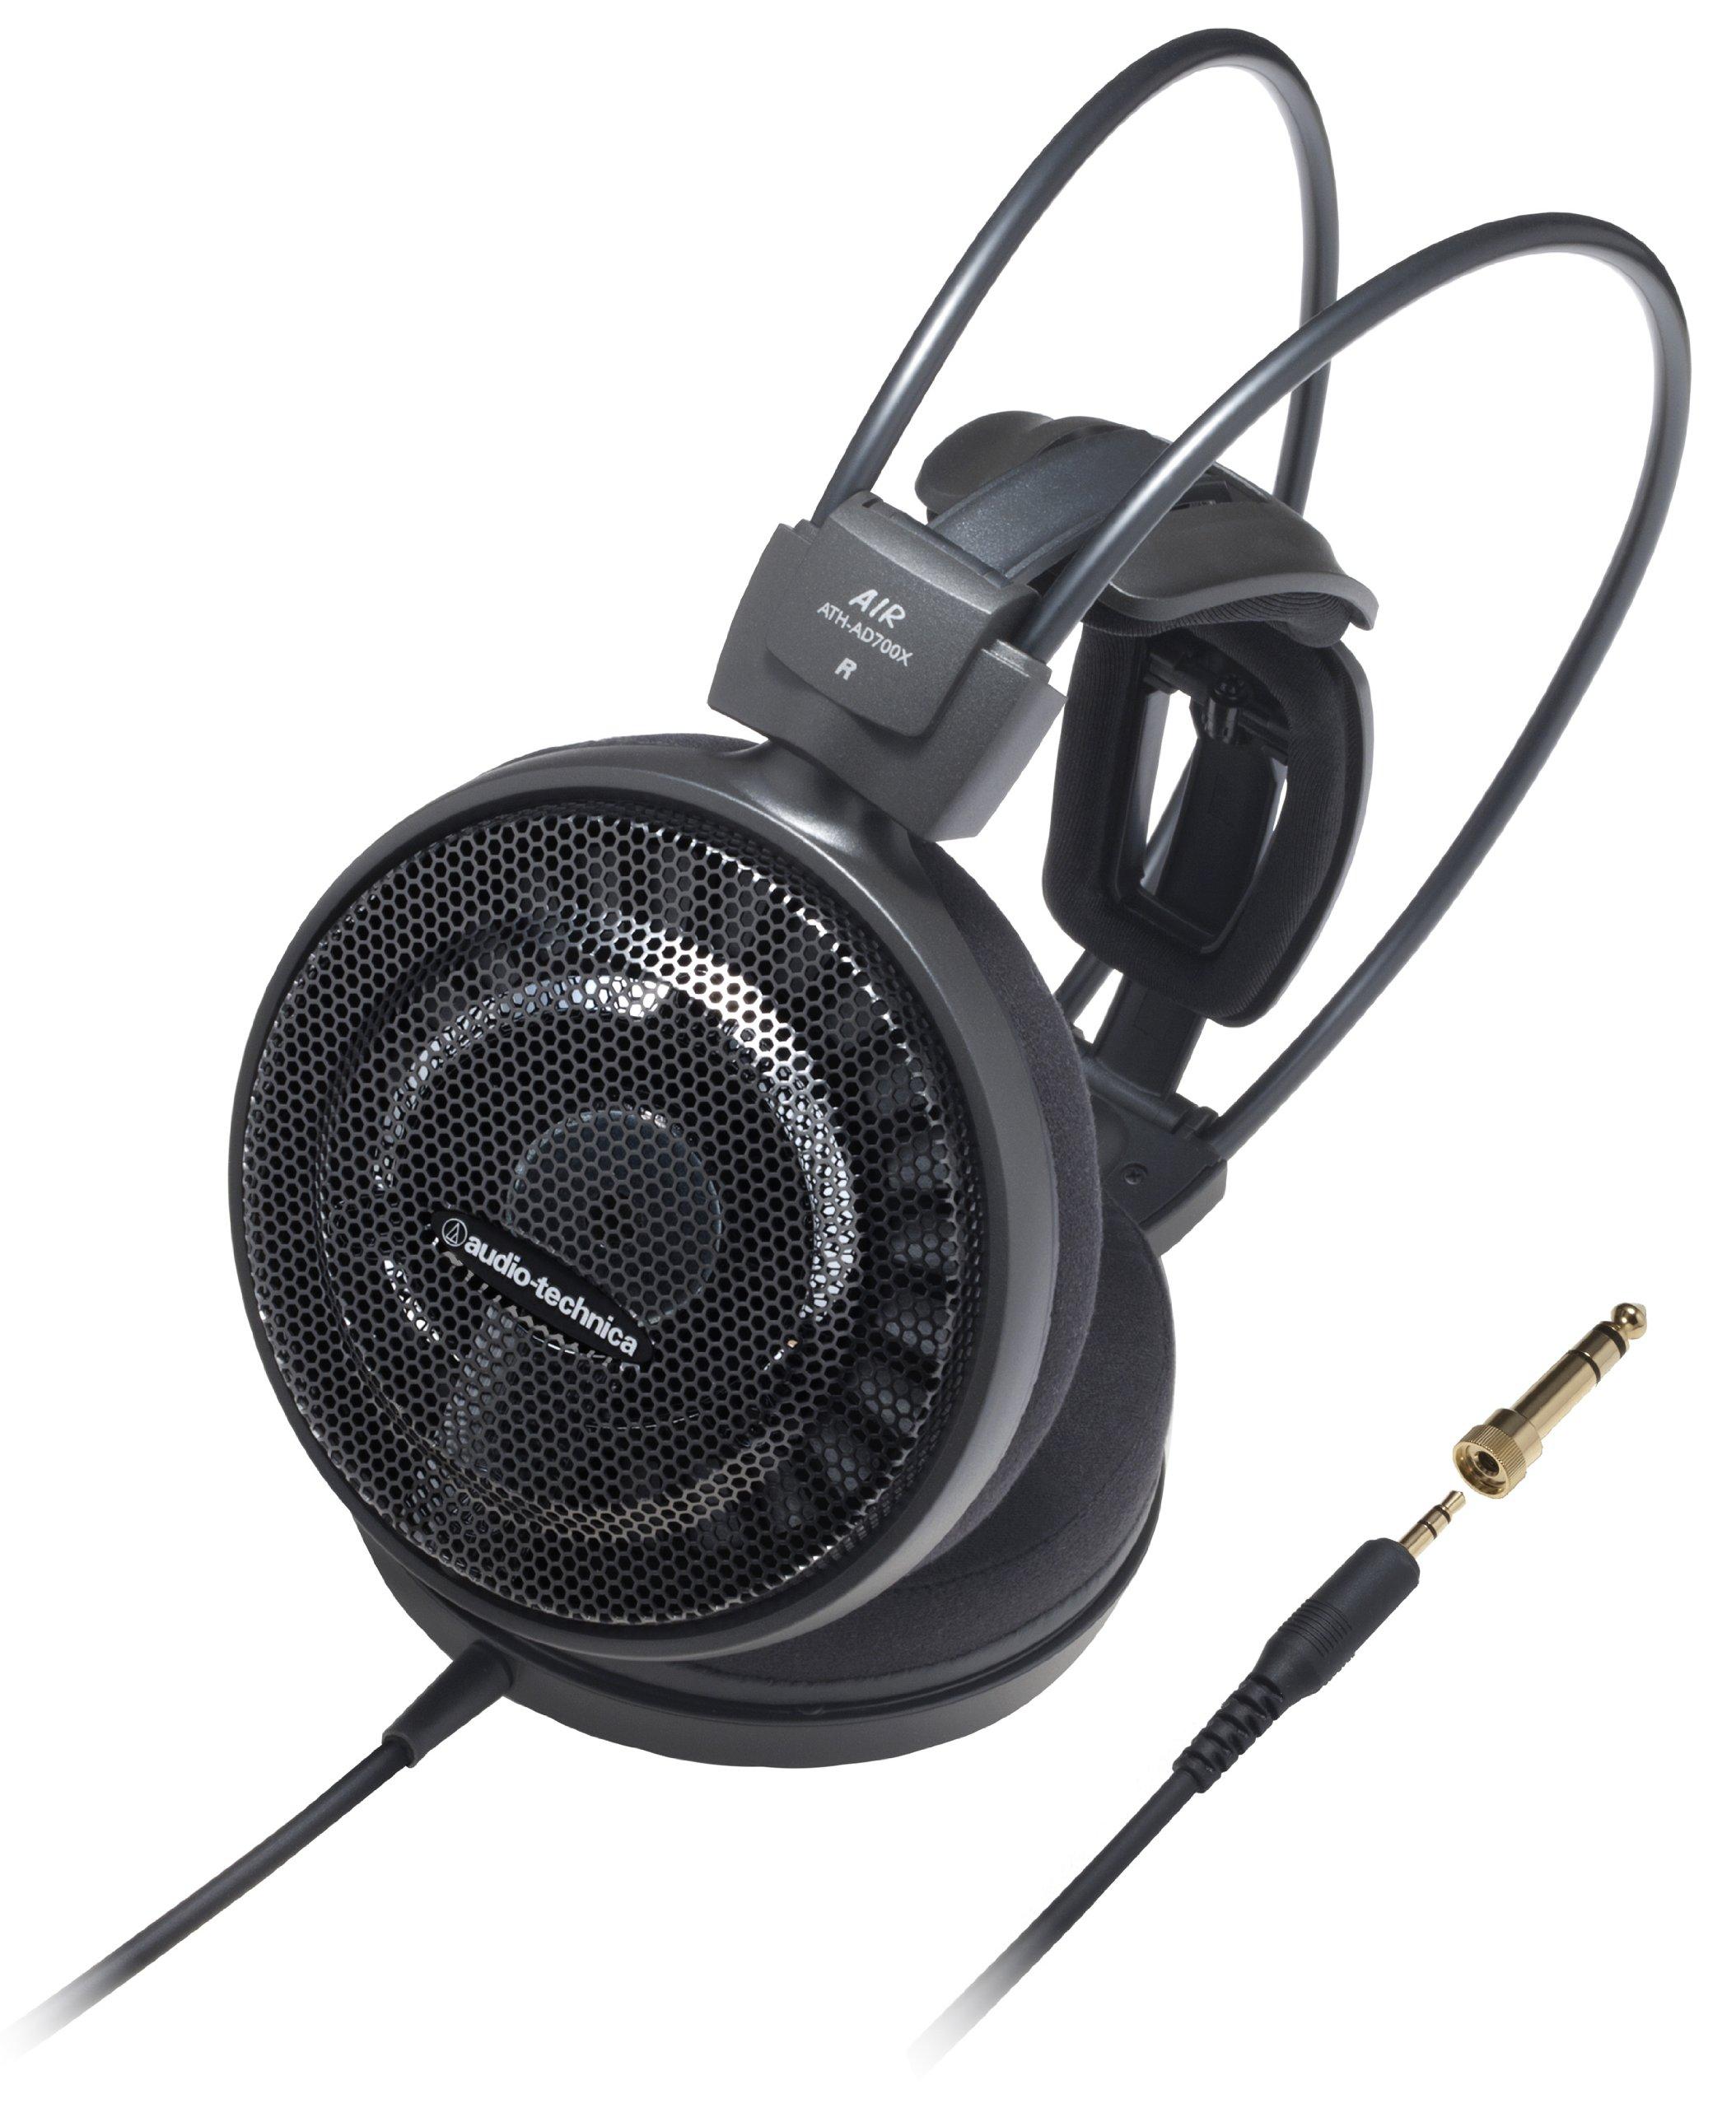 Audio Technica ATH-AD700X On-Ear Ausinės (6,3mm Klinkenstecker) schwarz